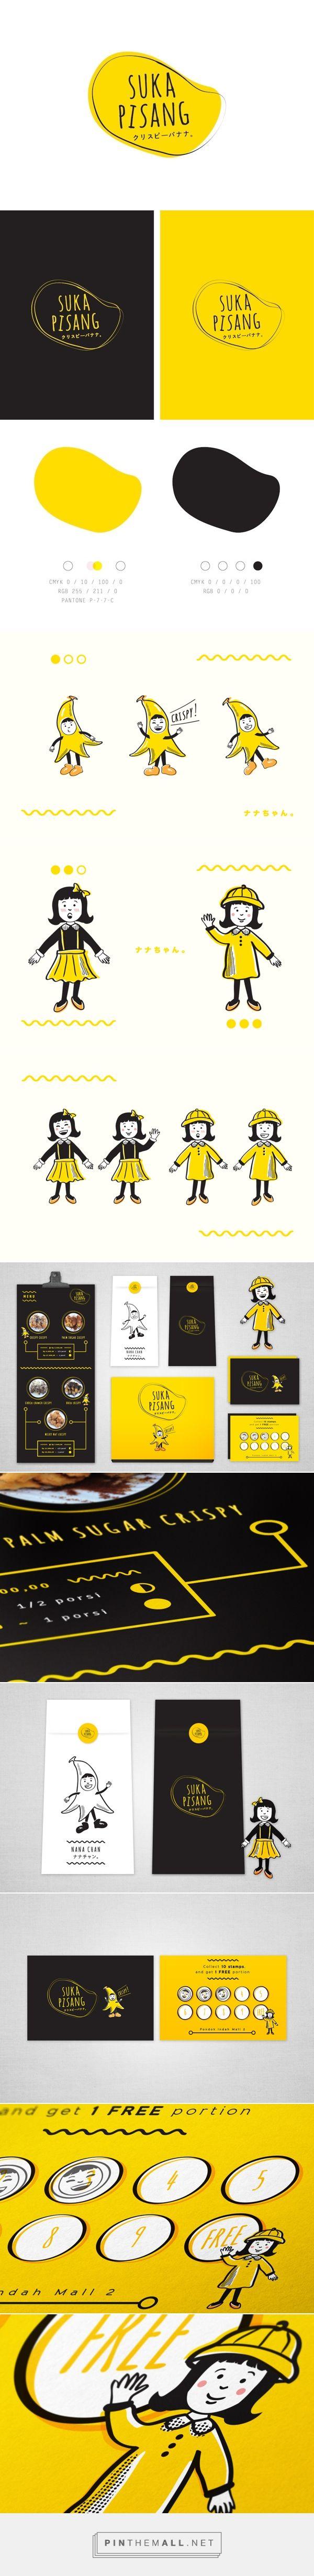 Animated Aesthetic Banana - 5e9774ce4c0cfd842cf7586df561e157--pisang-desain_Amazing Animated Aesthetic Banana - 5e9774ce4c0cfd842cf7586df561e157--pisang-desain  Picture_735218.jpg